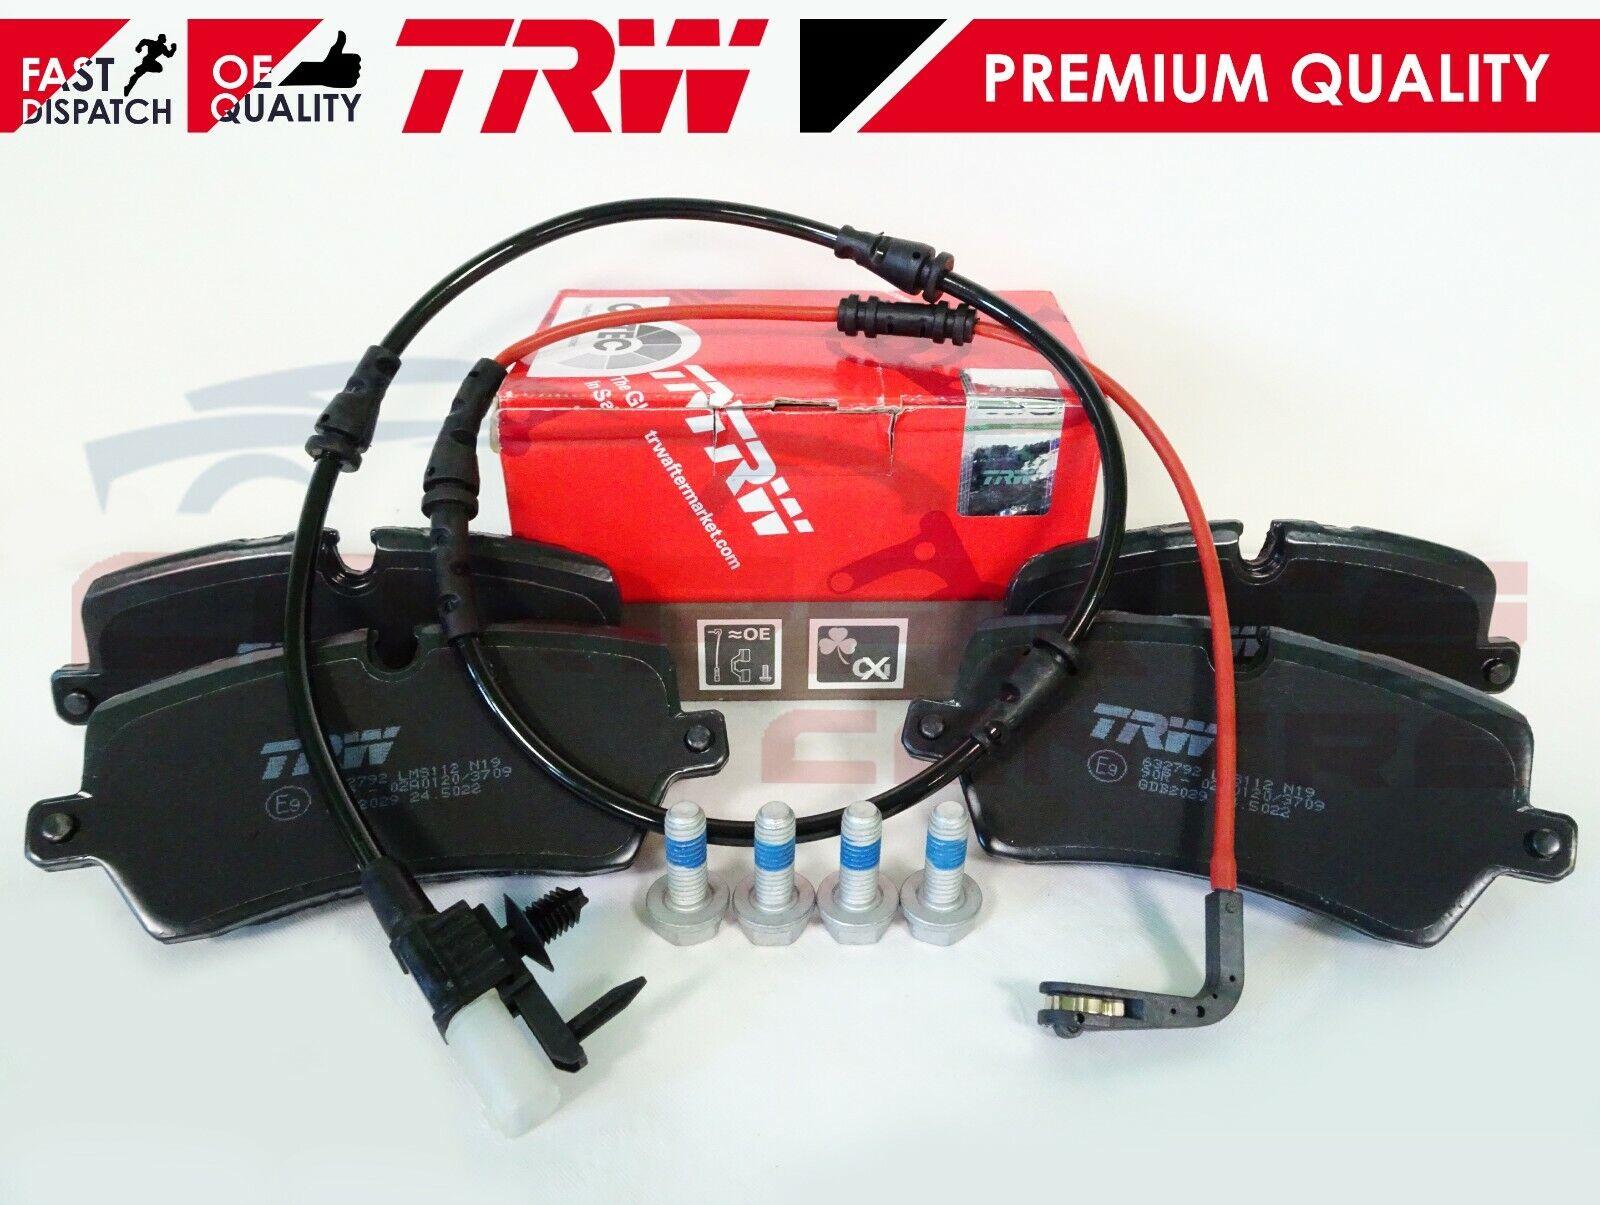 Fits Honda Accord MK7 2.2 Type-R Genuine TRW Rear Brake Pads Set